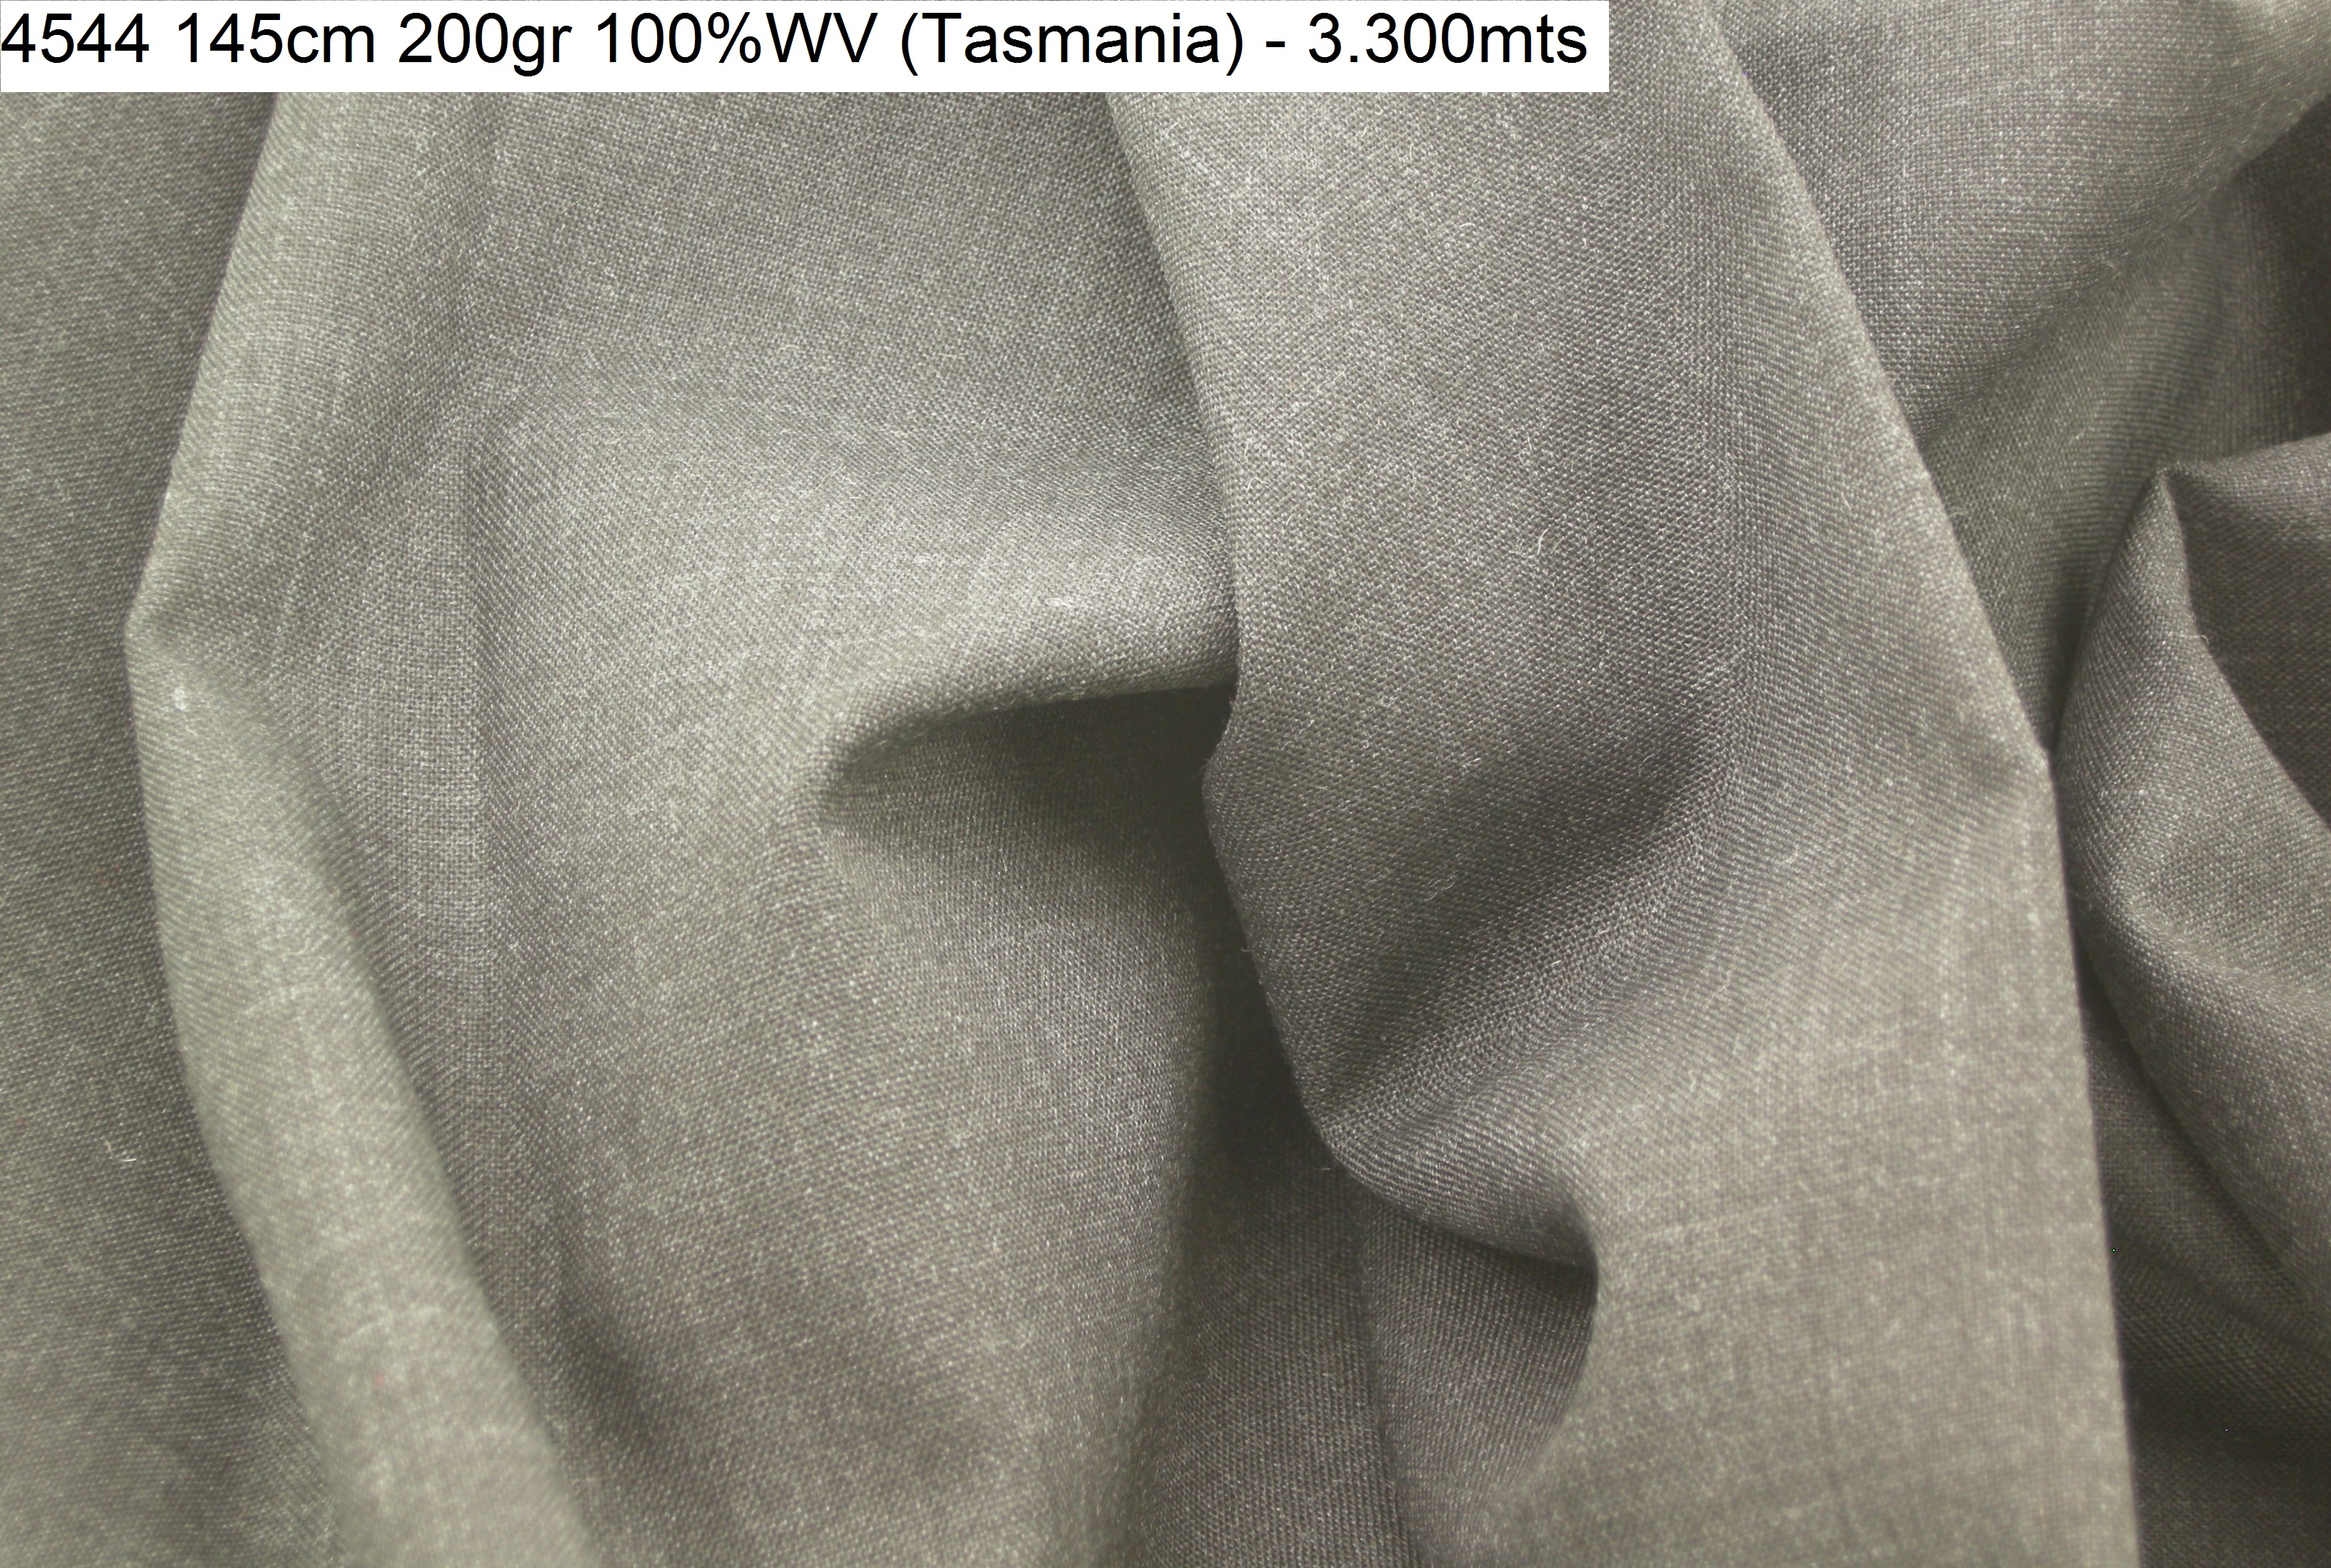 4544 tasmania wool classic italian taylor jacket fabric